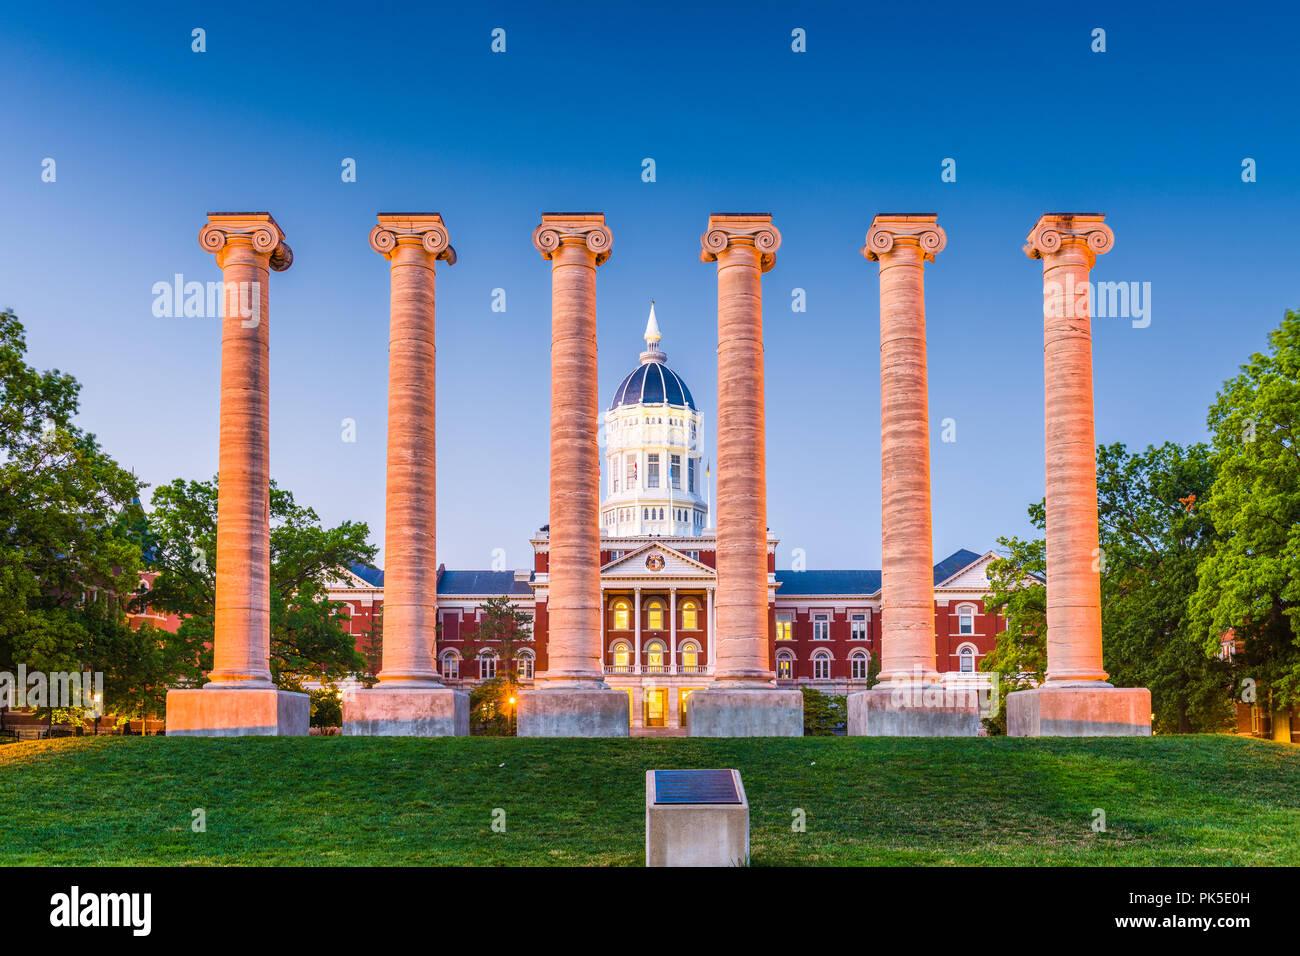 Columbia, Missouri, EE.UU. en la Universidad de Missouri. Imagen De Stock